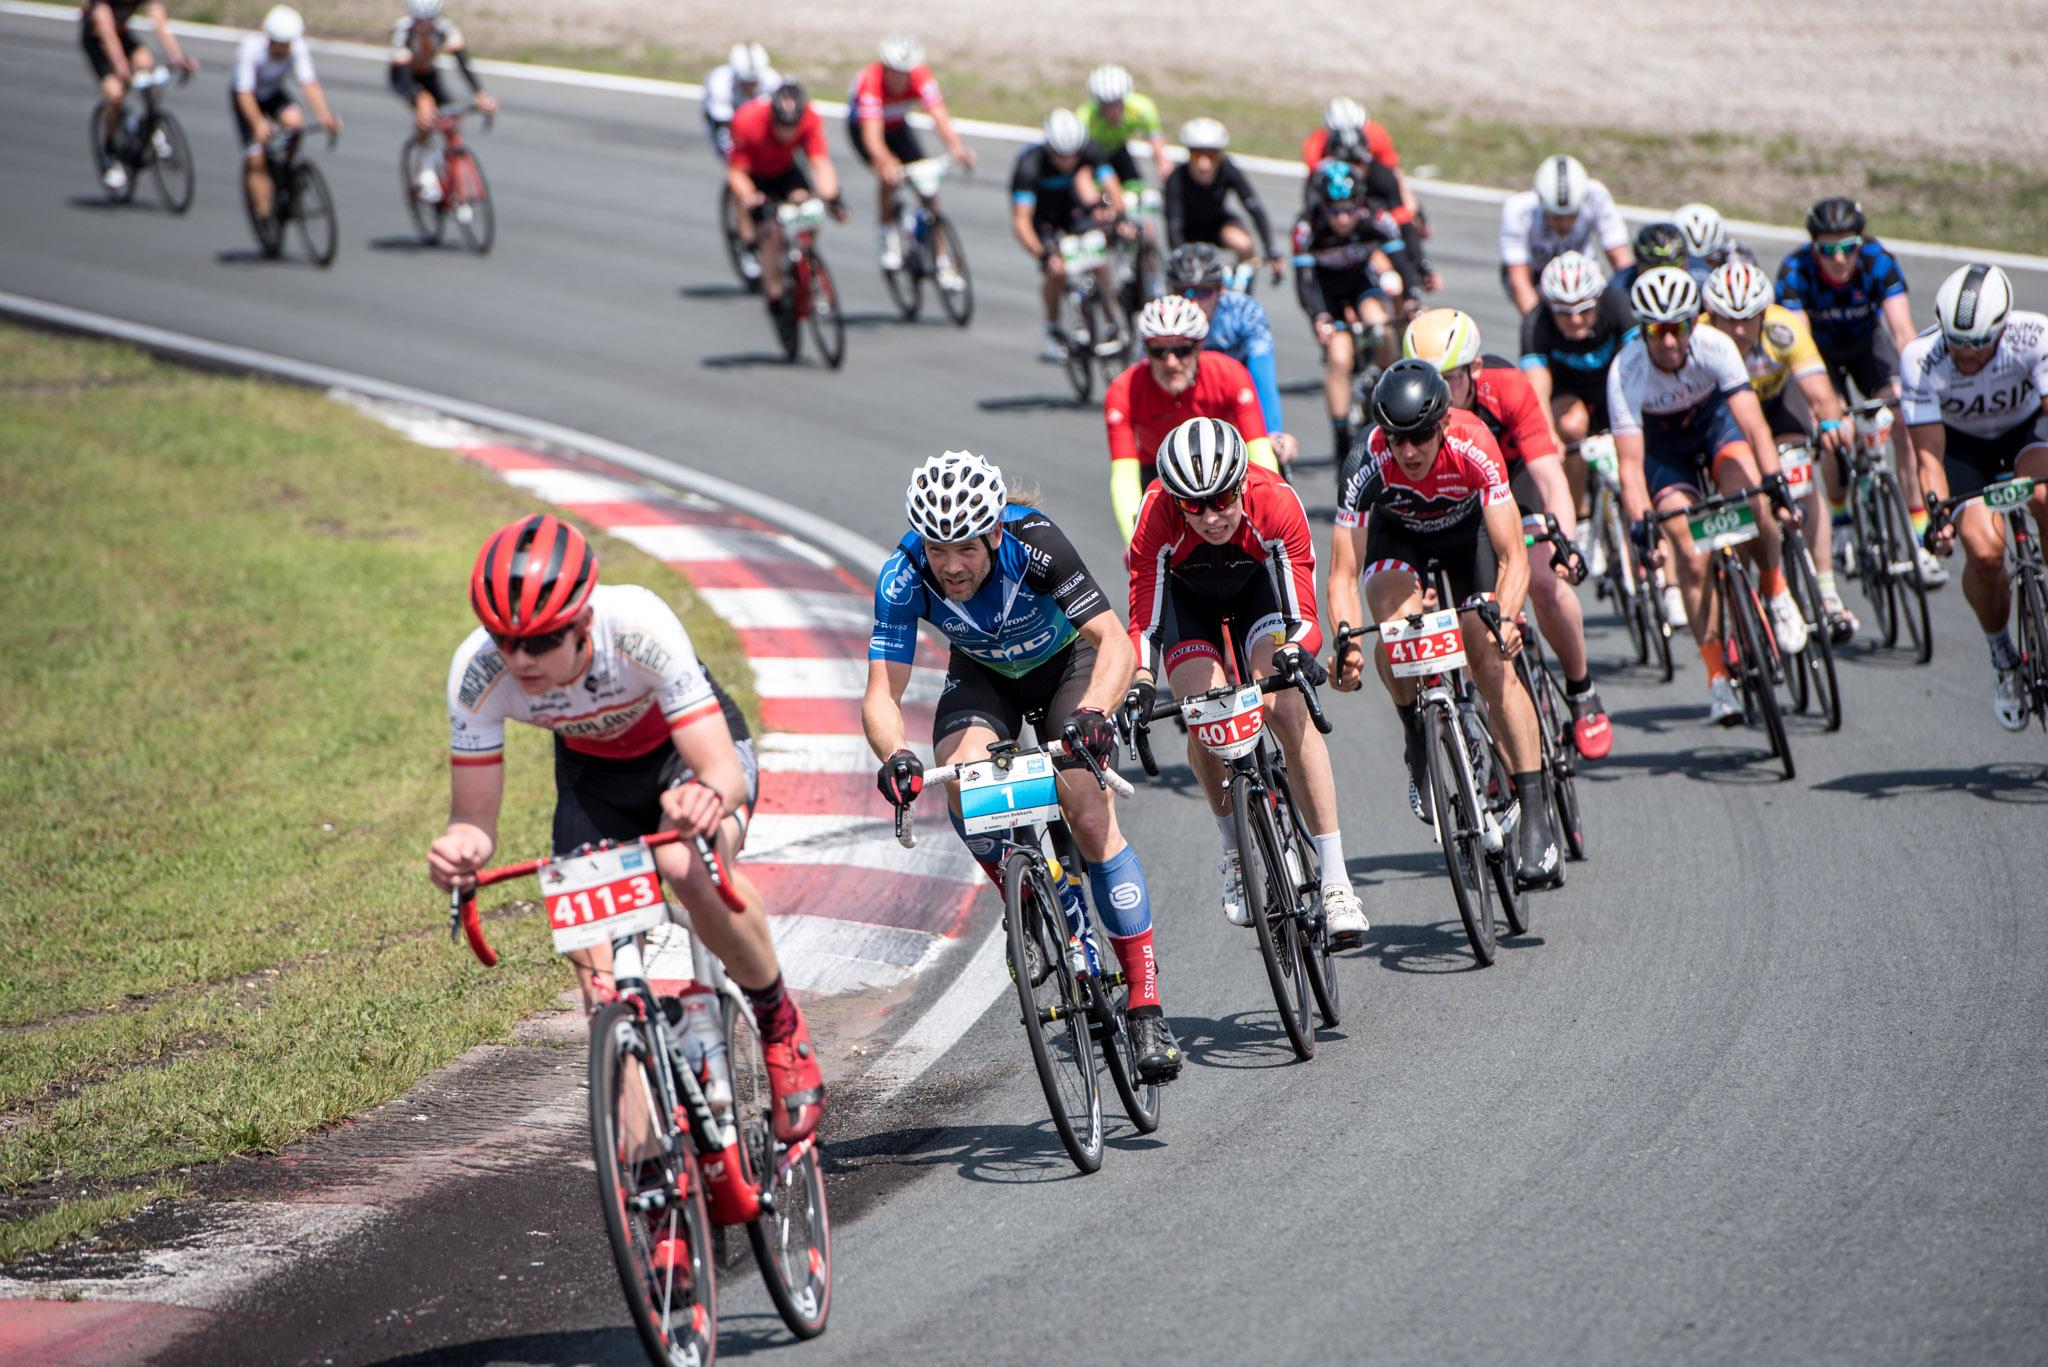 Datum 2020 bekend: inschrijving geopend cycling zandvoort 2020